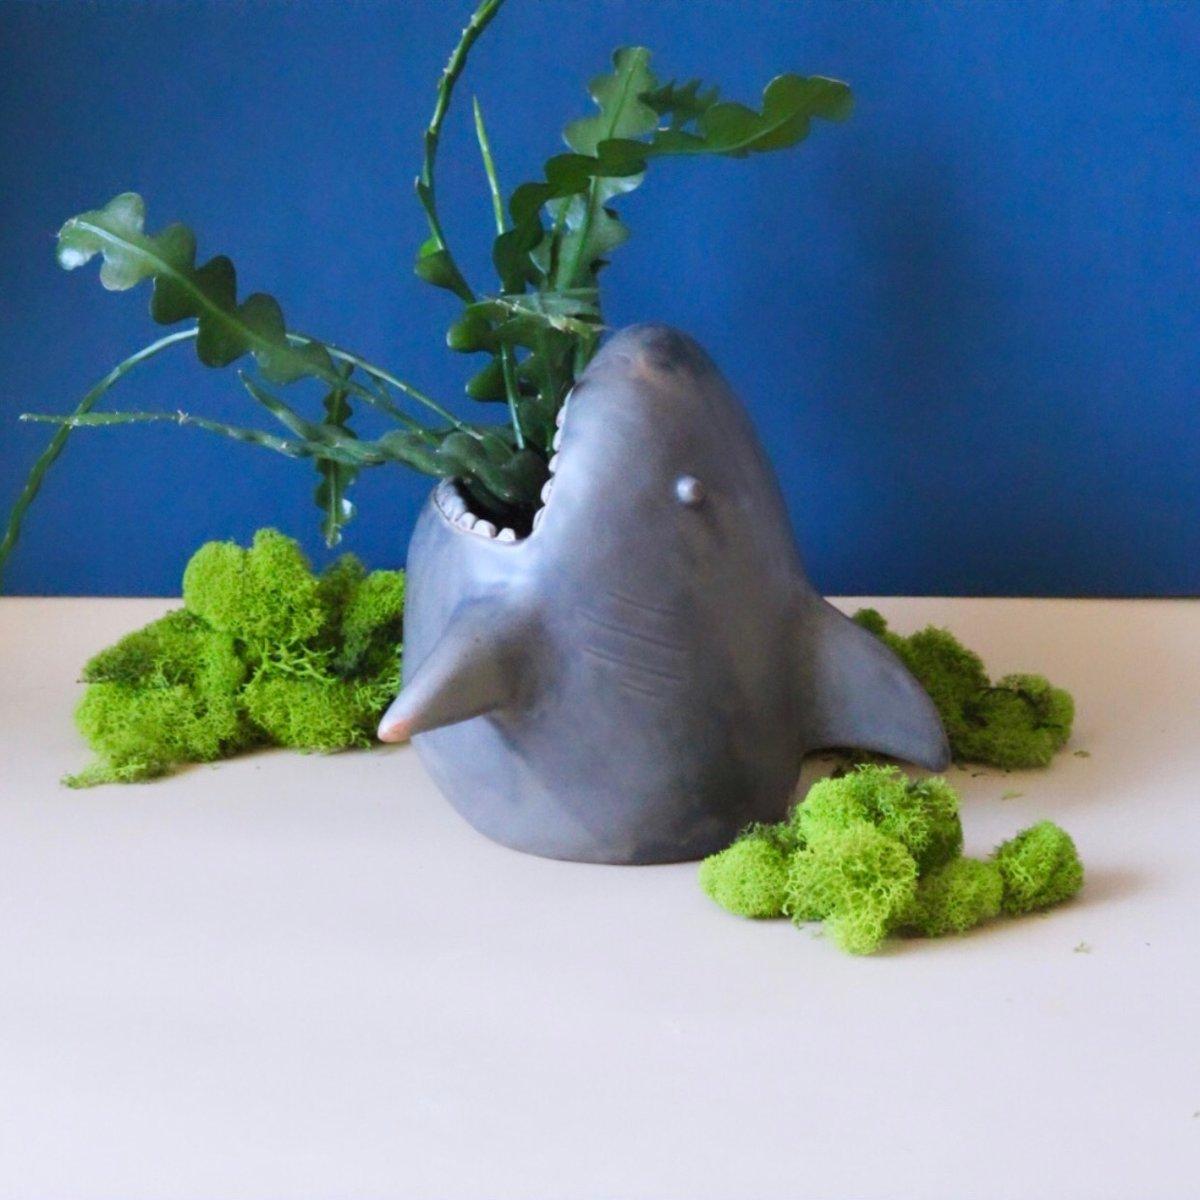 Image of Greenland shark planter